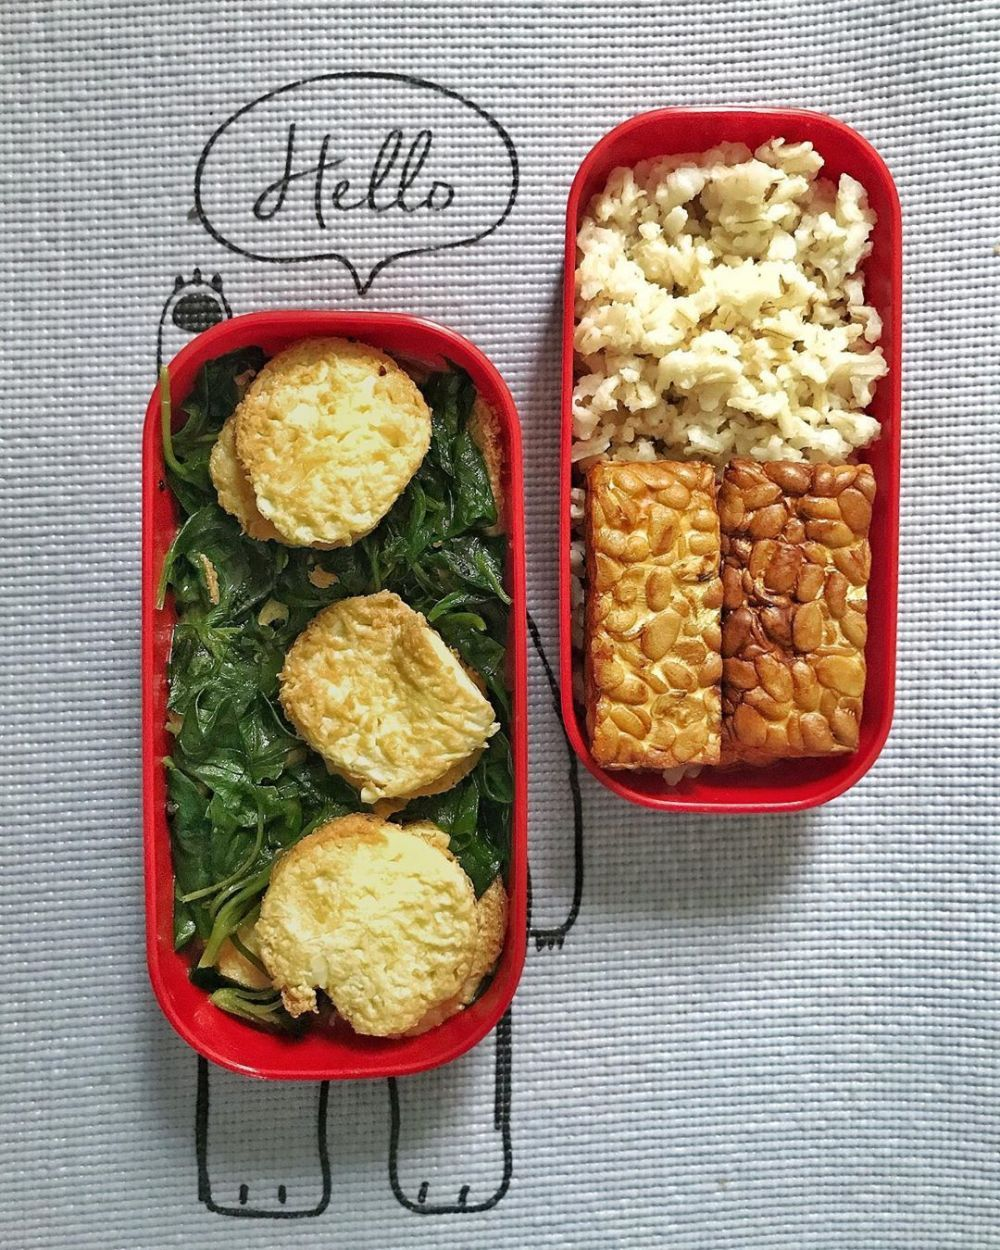 Bekal Makan Siang Berbagai Sumber Makan Siang Makanan Makanan Dan Minuman